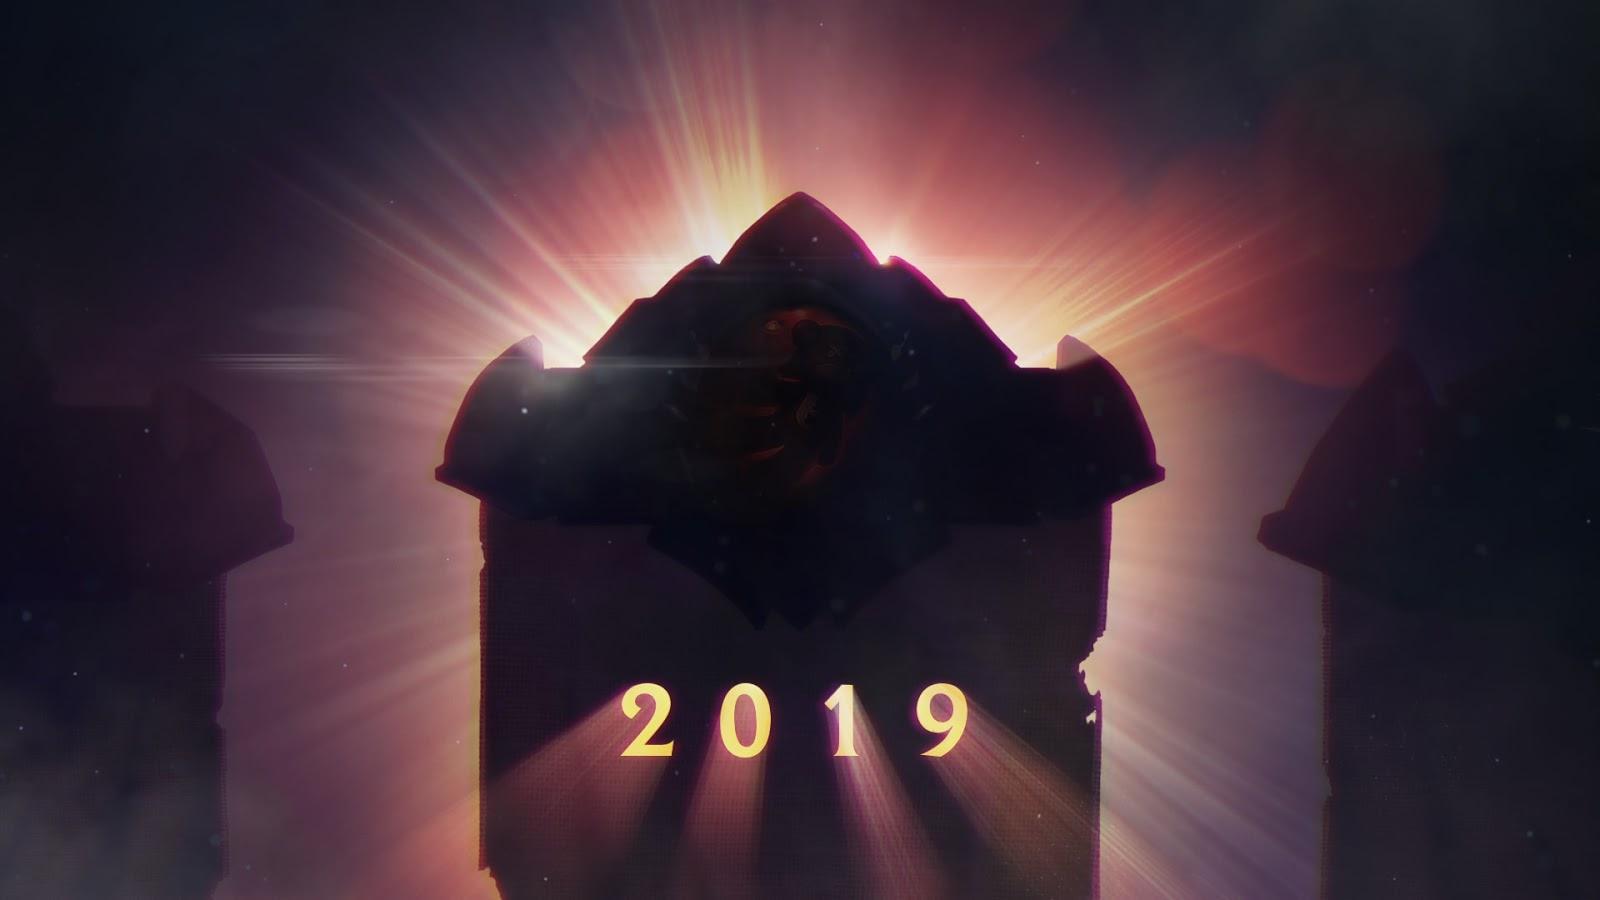 lol season 2019